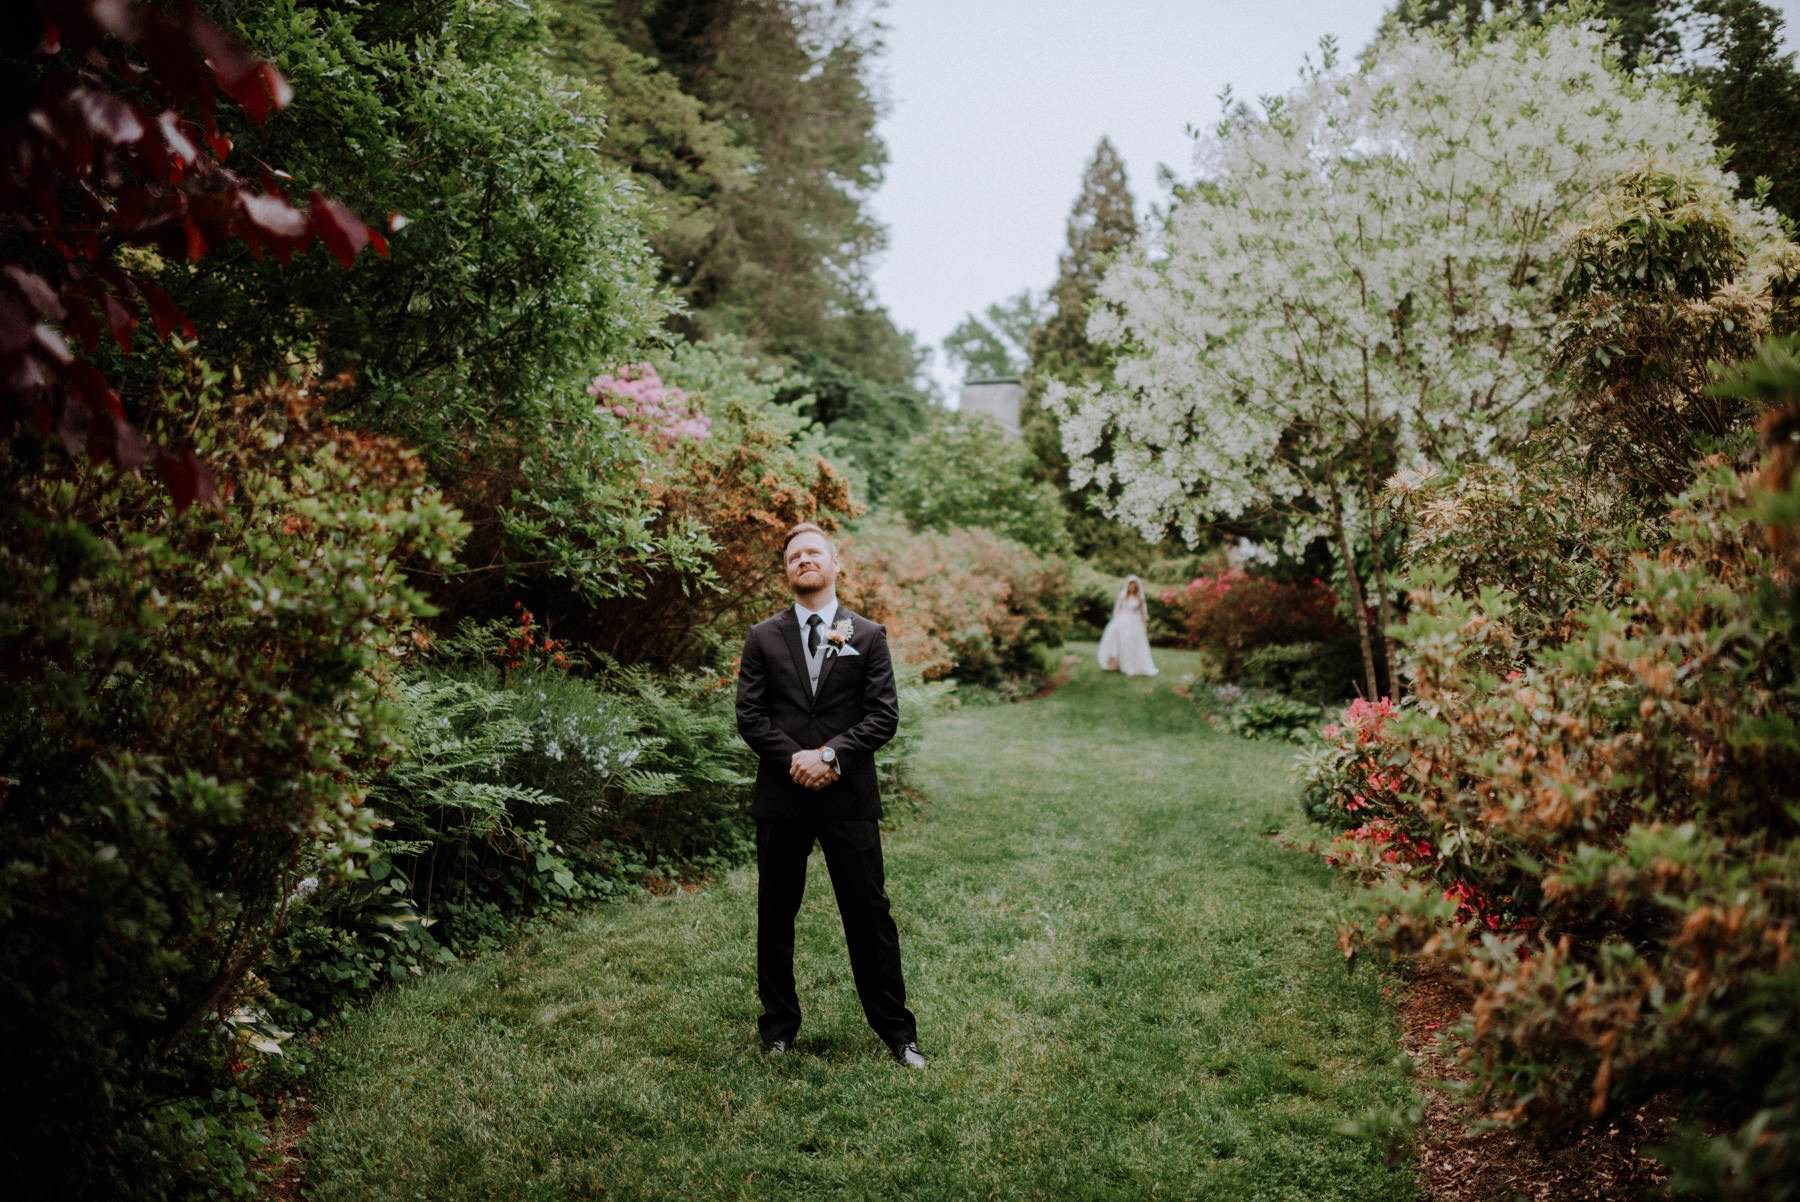 welkinweir-wedding-photography-7.jpg